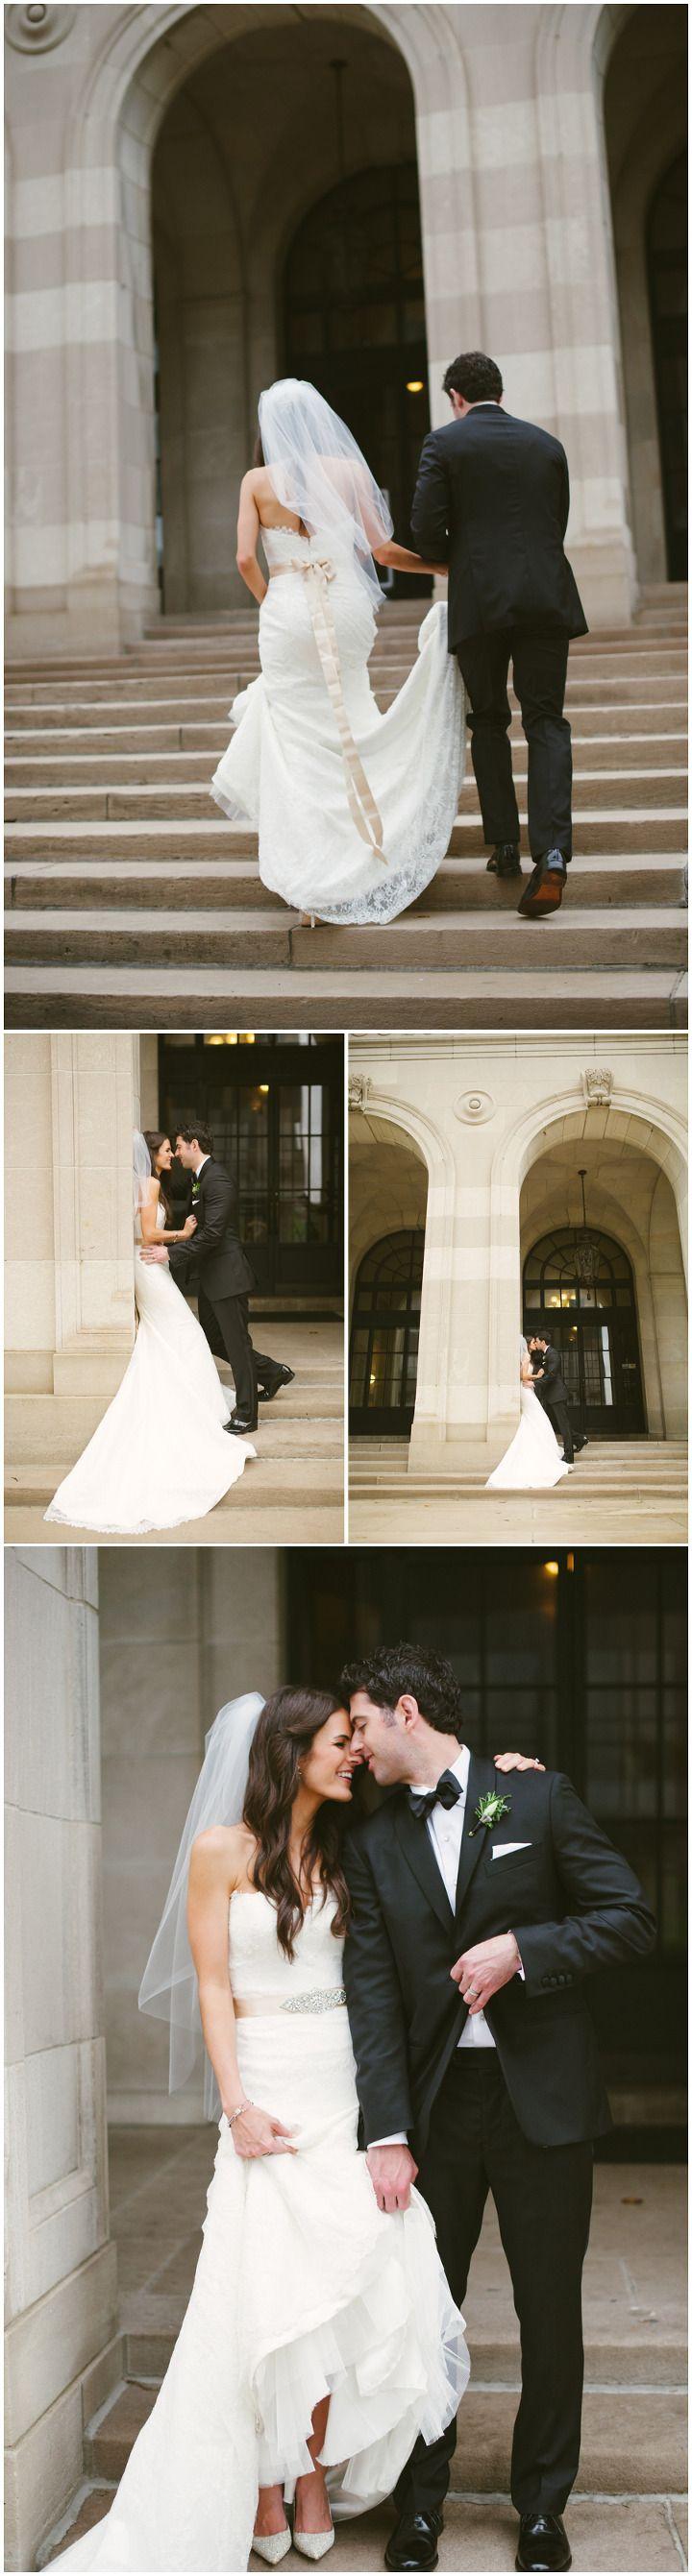 Bride And Groom Wedding Day Portraits. Romantic Portraits. Columbus Ohio  Wedding Photography. Ashley